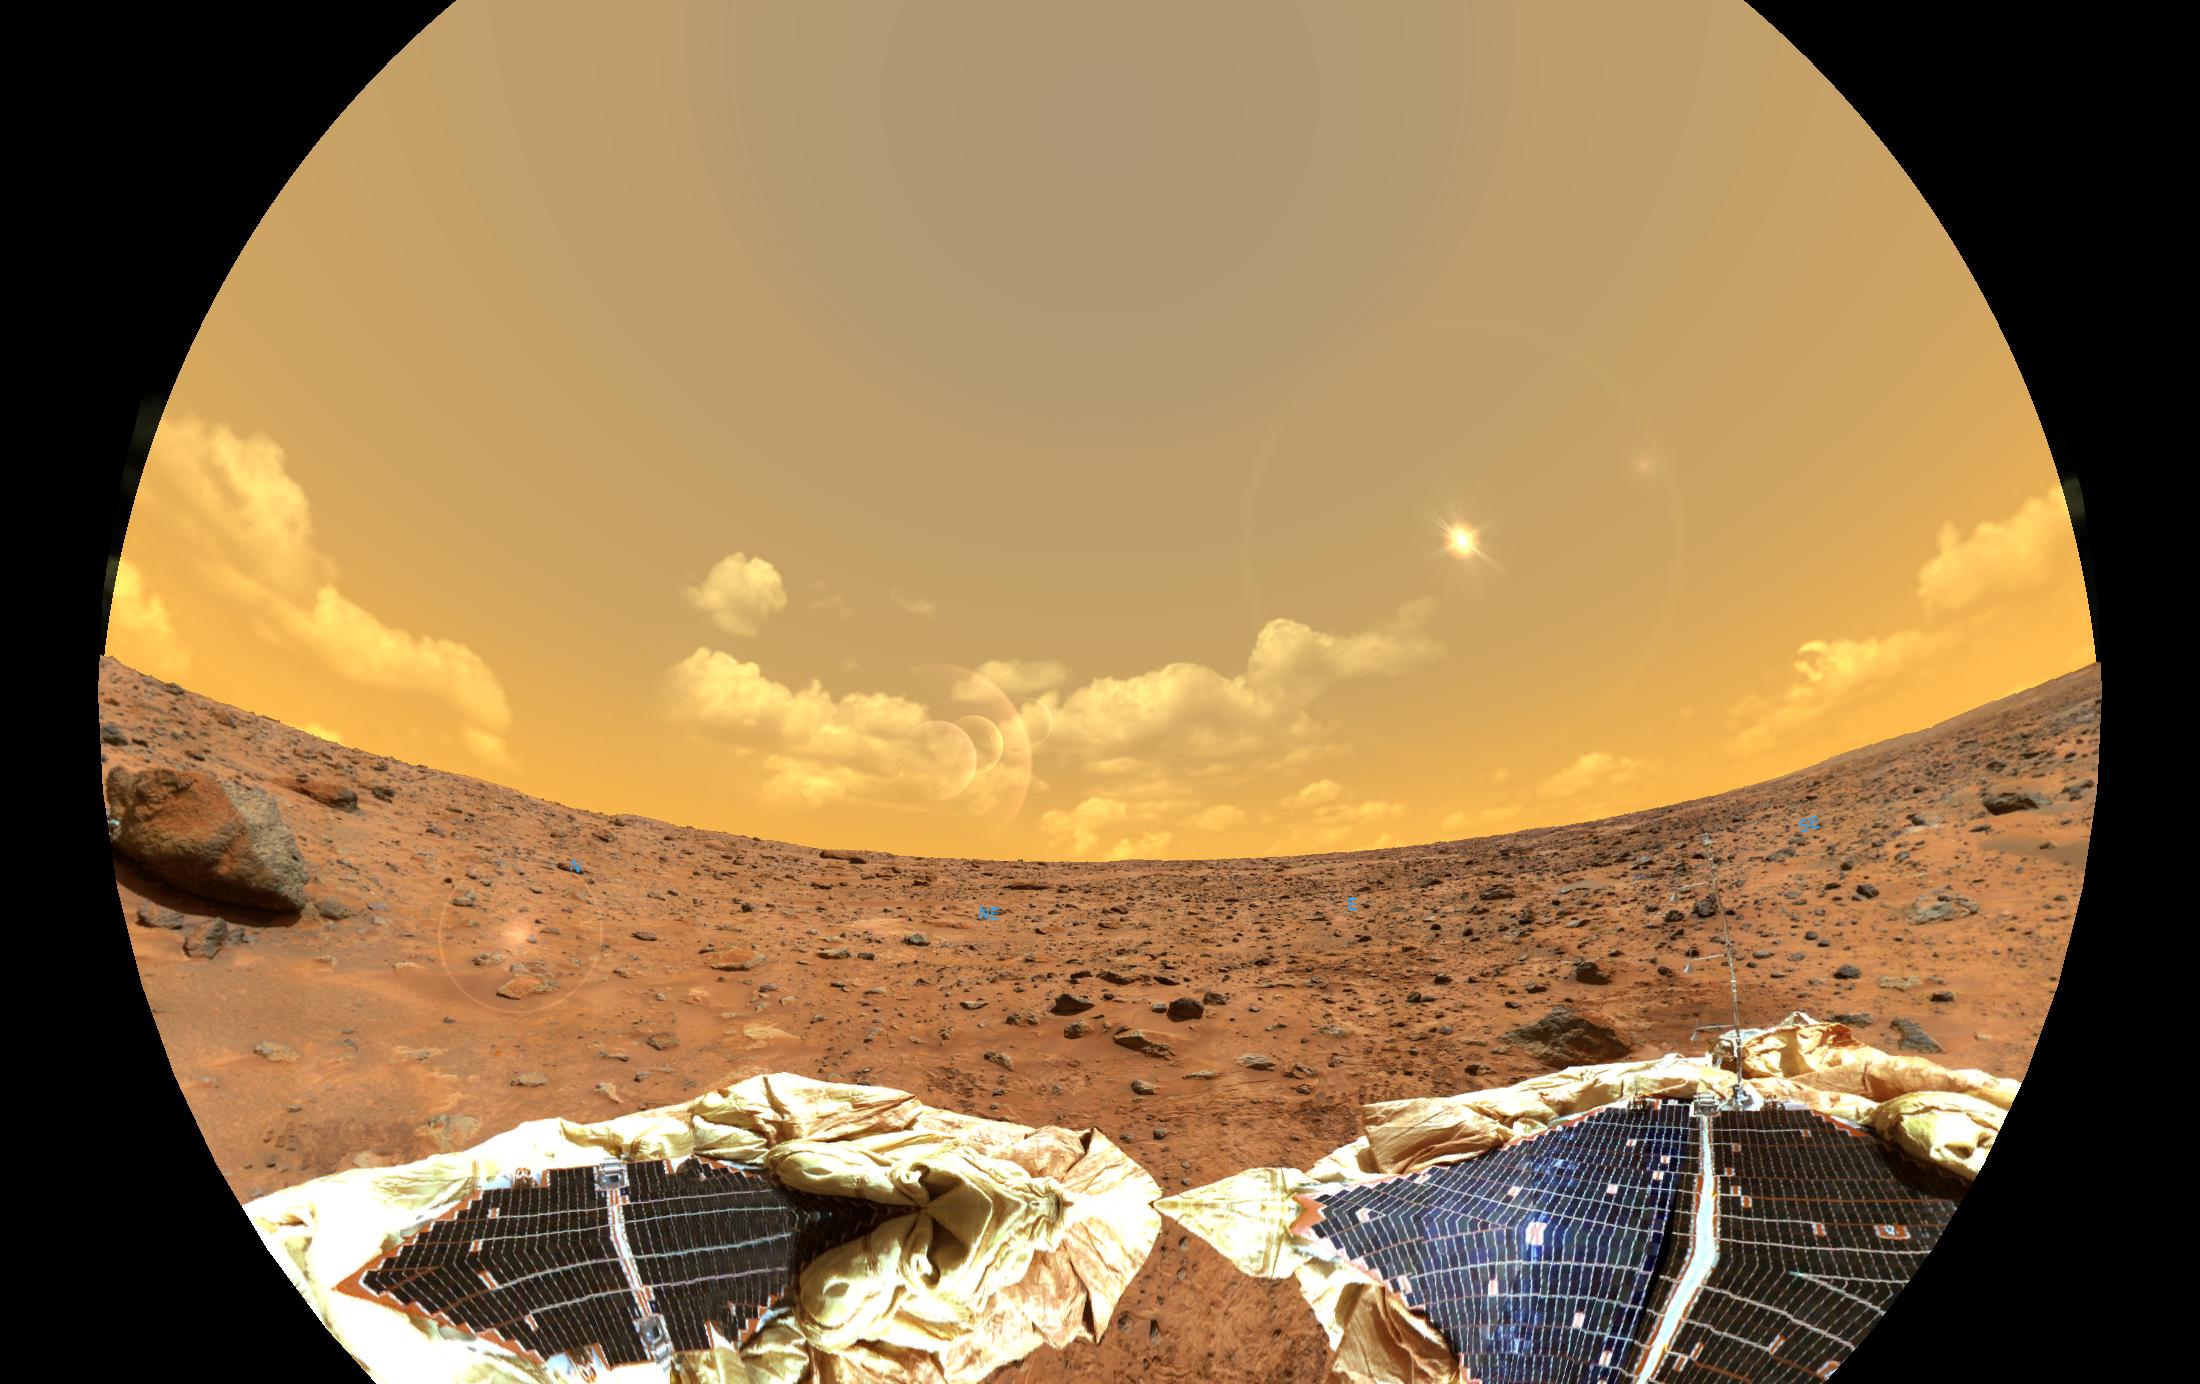 Mars HD wallpapers, Desktop wallpaper - most viewed